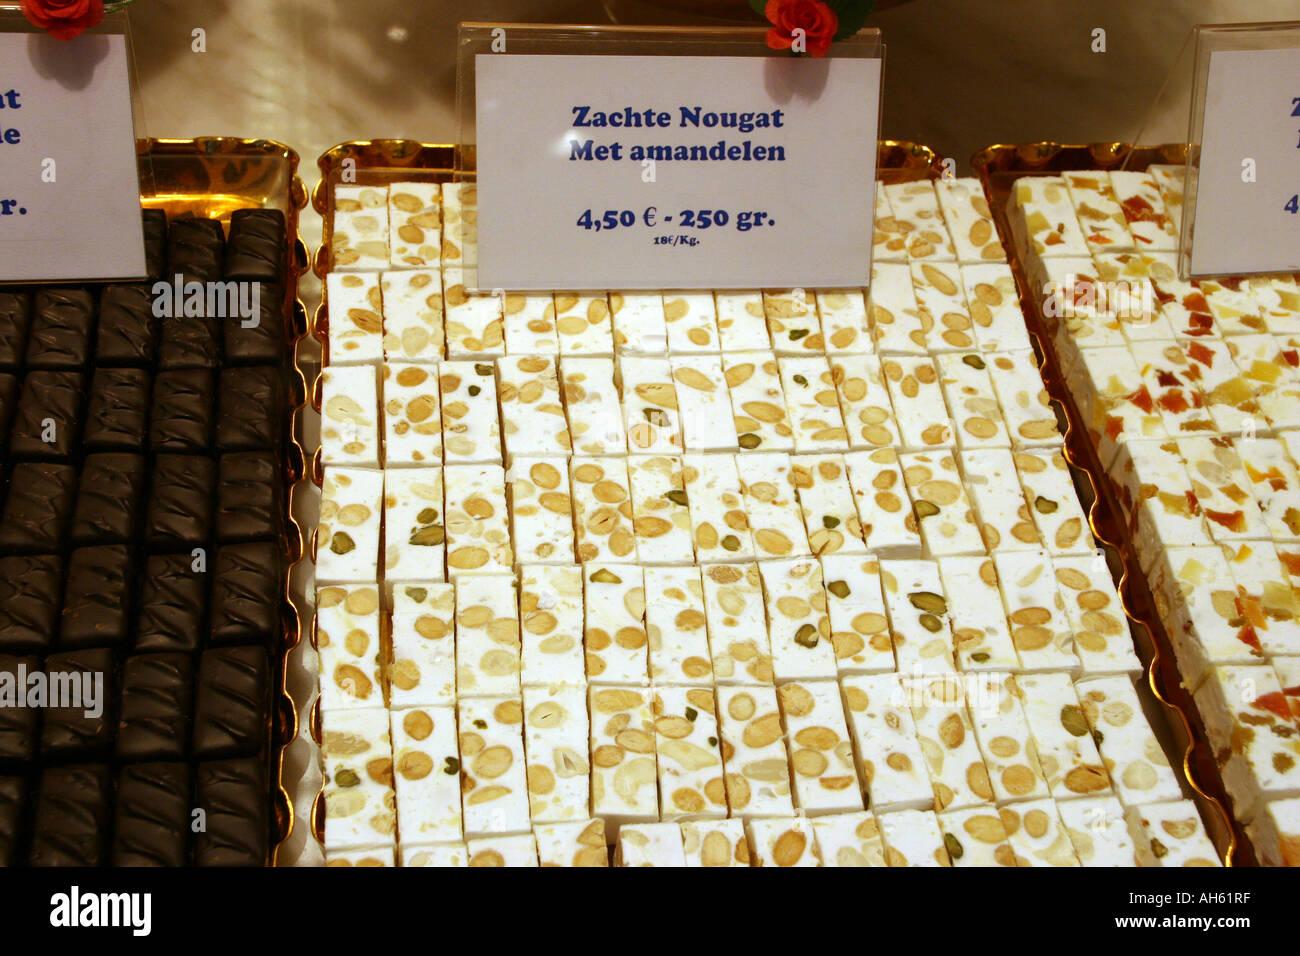 Expensive Chocolate Shop Stock Photos Amp Expensive